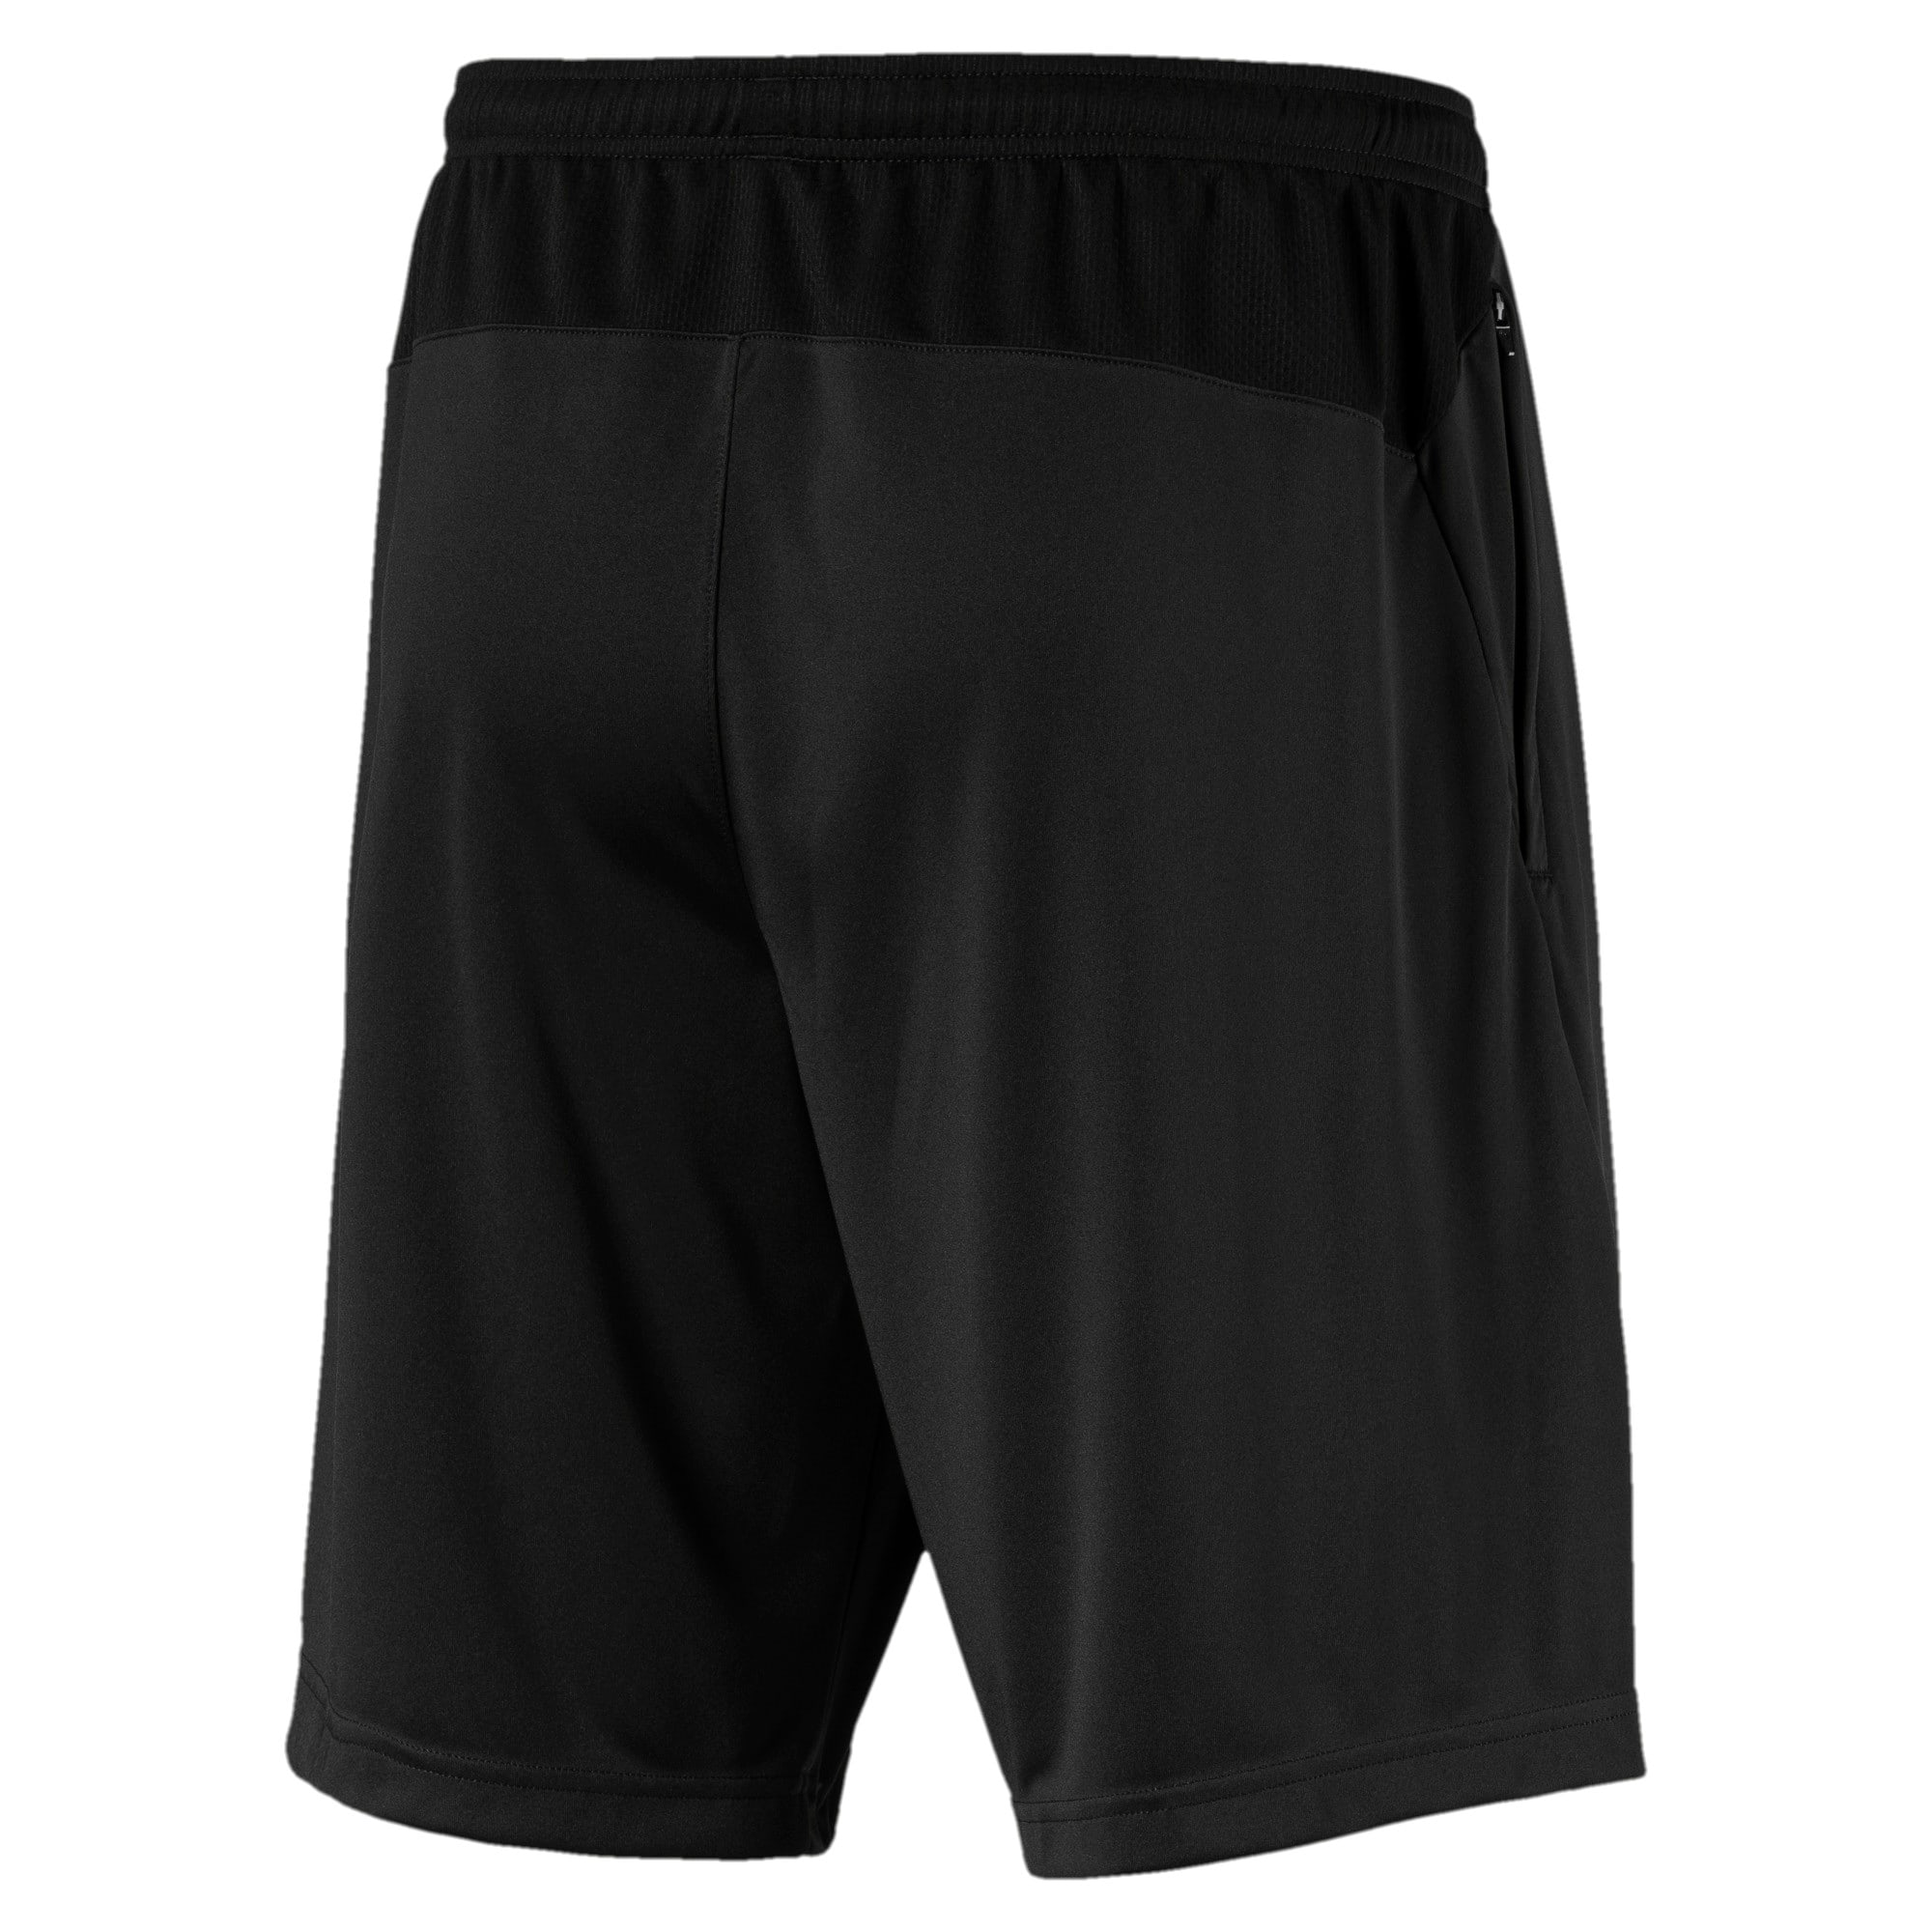 Thumbnail 5 of AC Milan Men's Training Shorts, Puma Black, medium